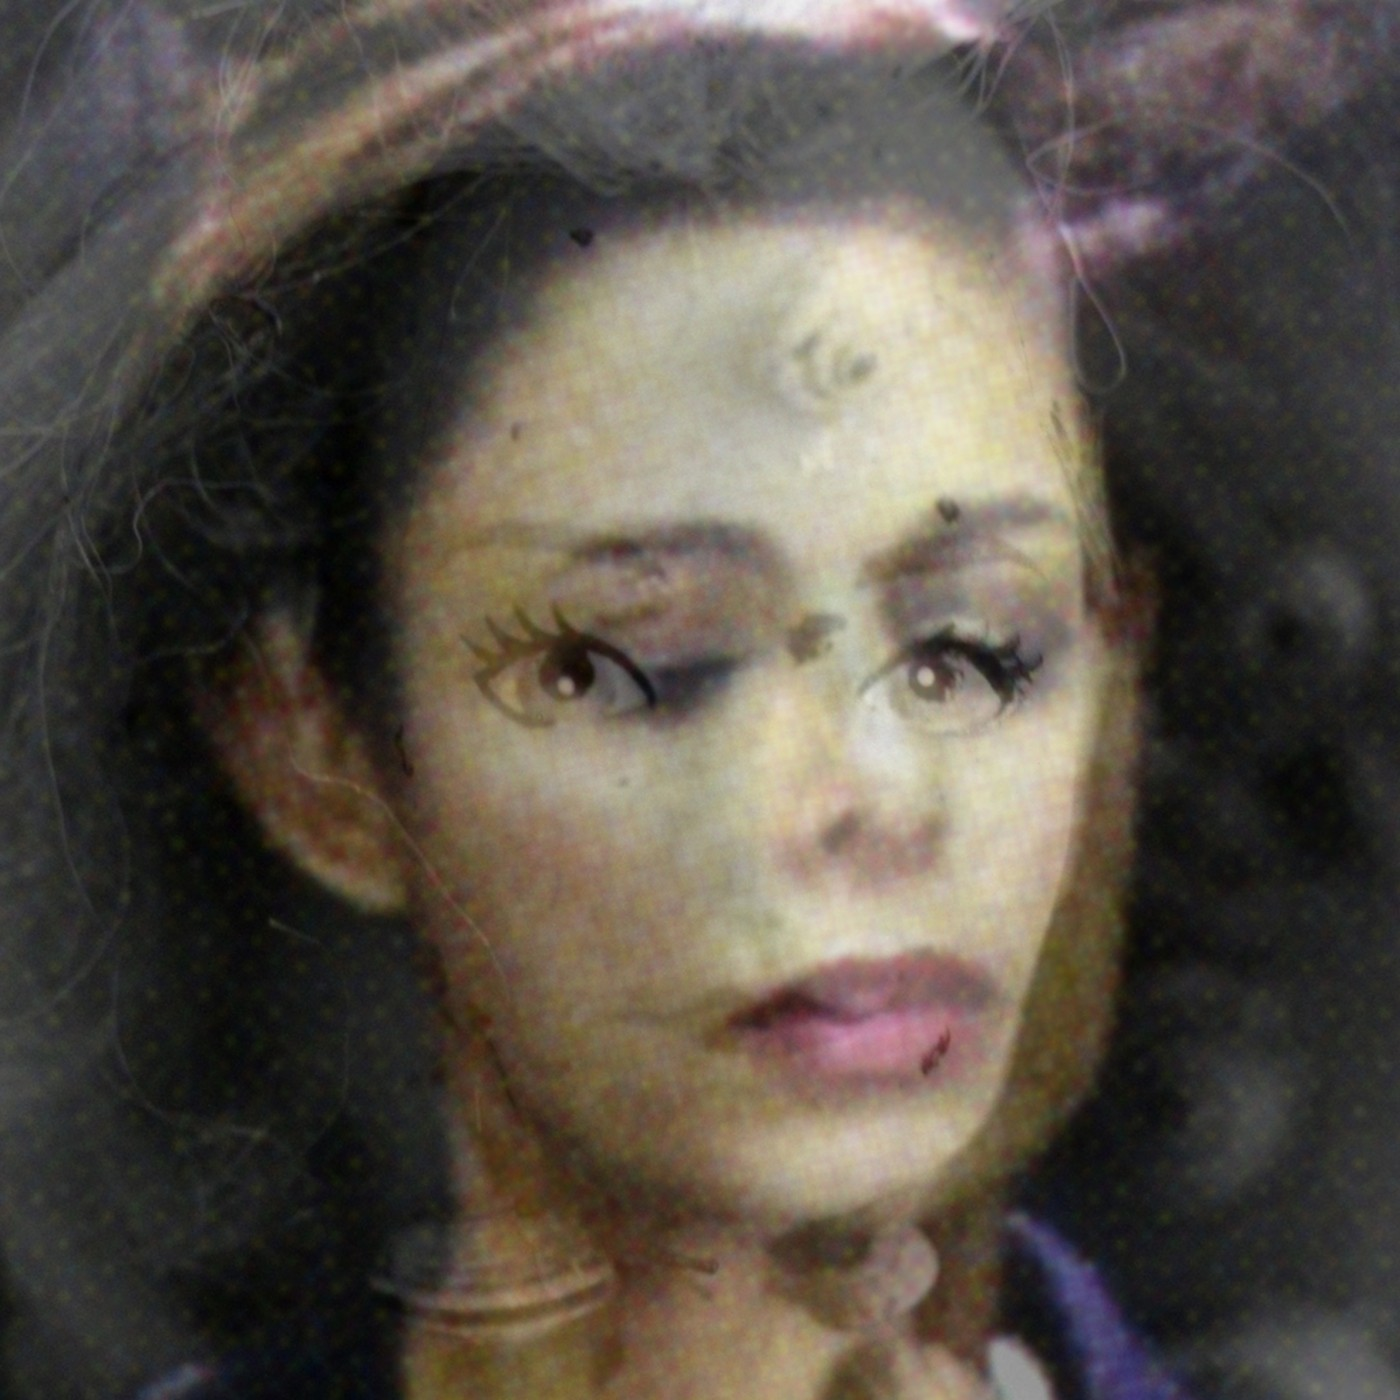 Gabrielle de Montmollin, </span><span><em>Lawyer-Snail Face (lenticular print)</em>, </span><span>2015